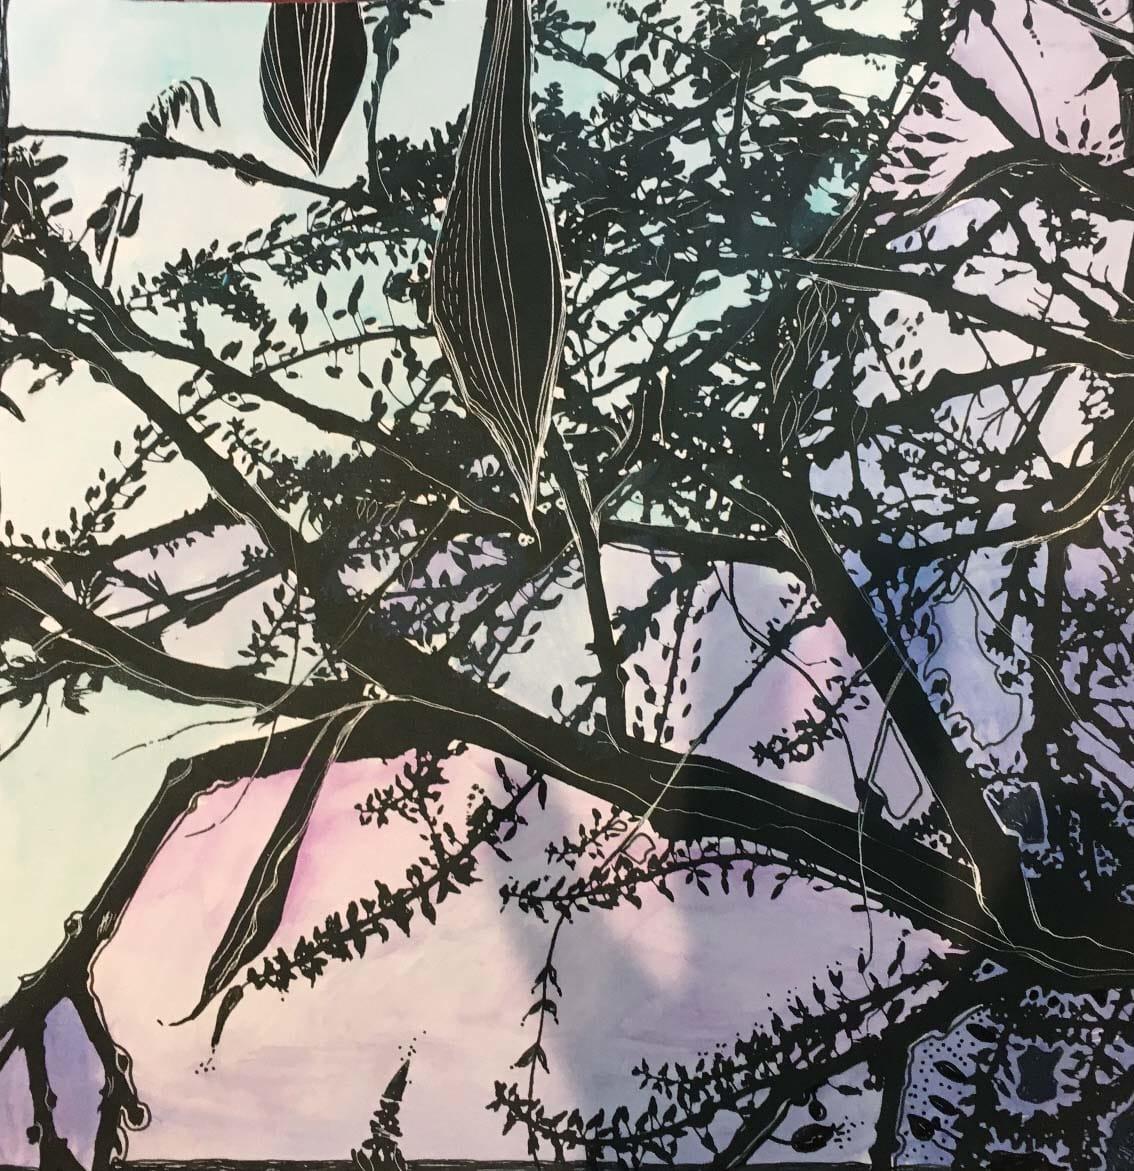 MCD166, Evening Wisteria by Ruth McDonald